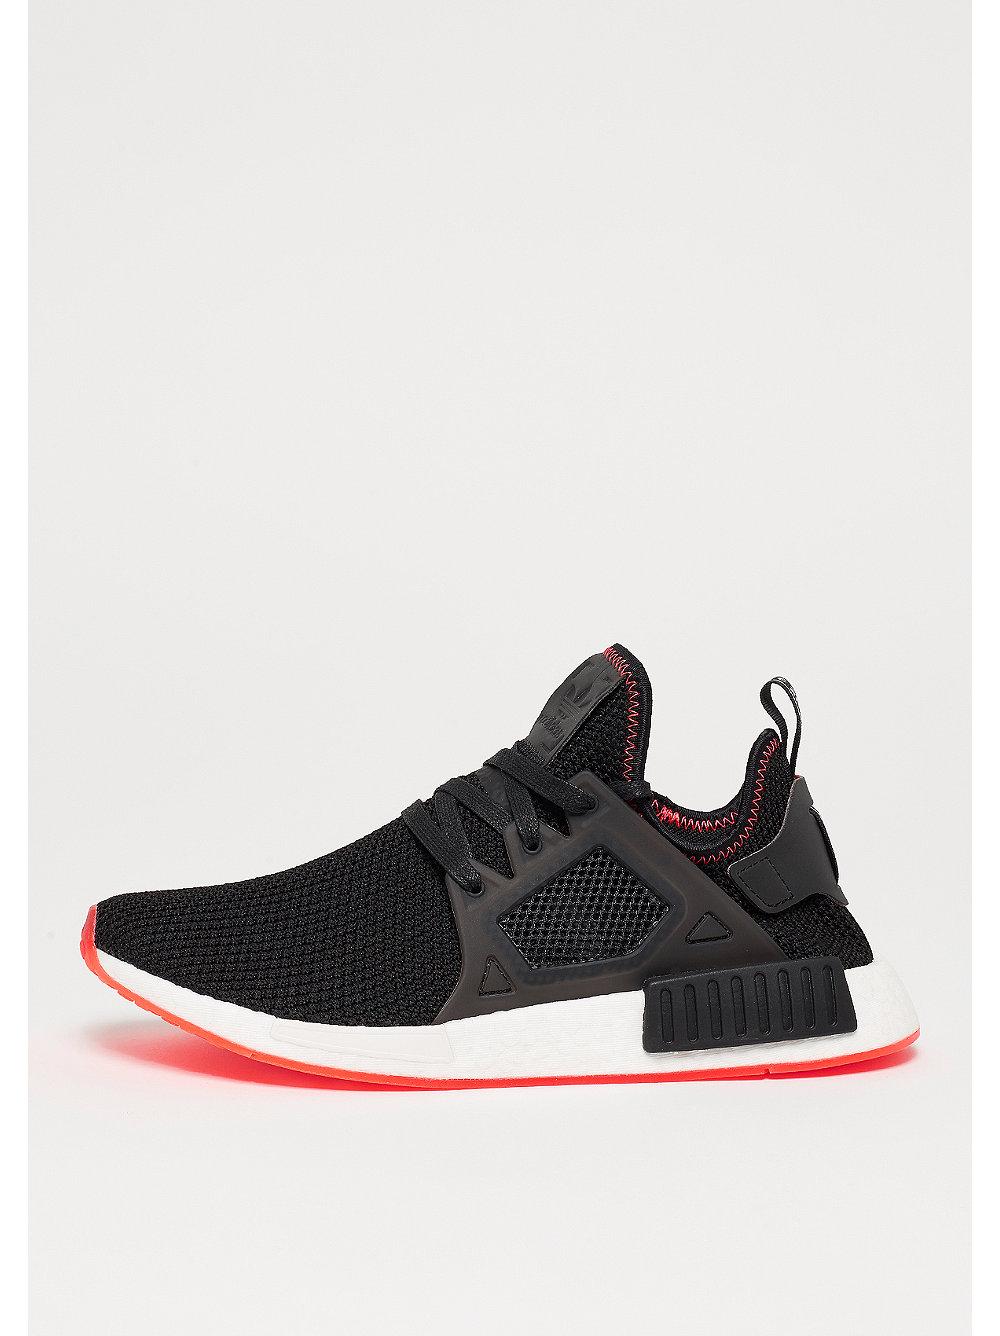 nmd xr1 sneaker core black von adidas bei snipes. Black Bedroom Furniture Sets. Home Design Ideas